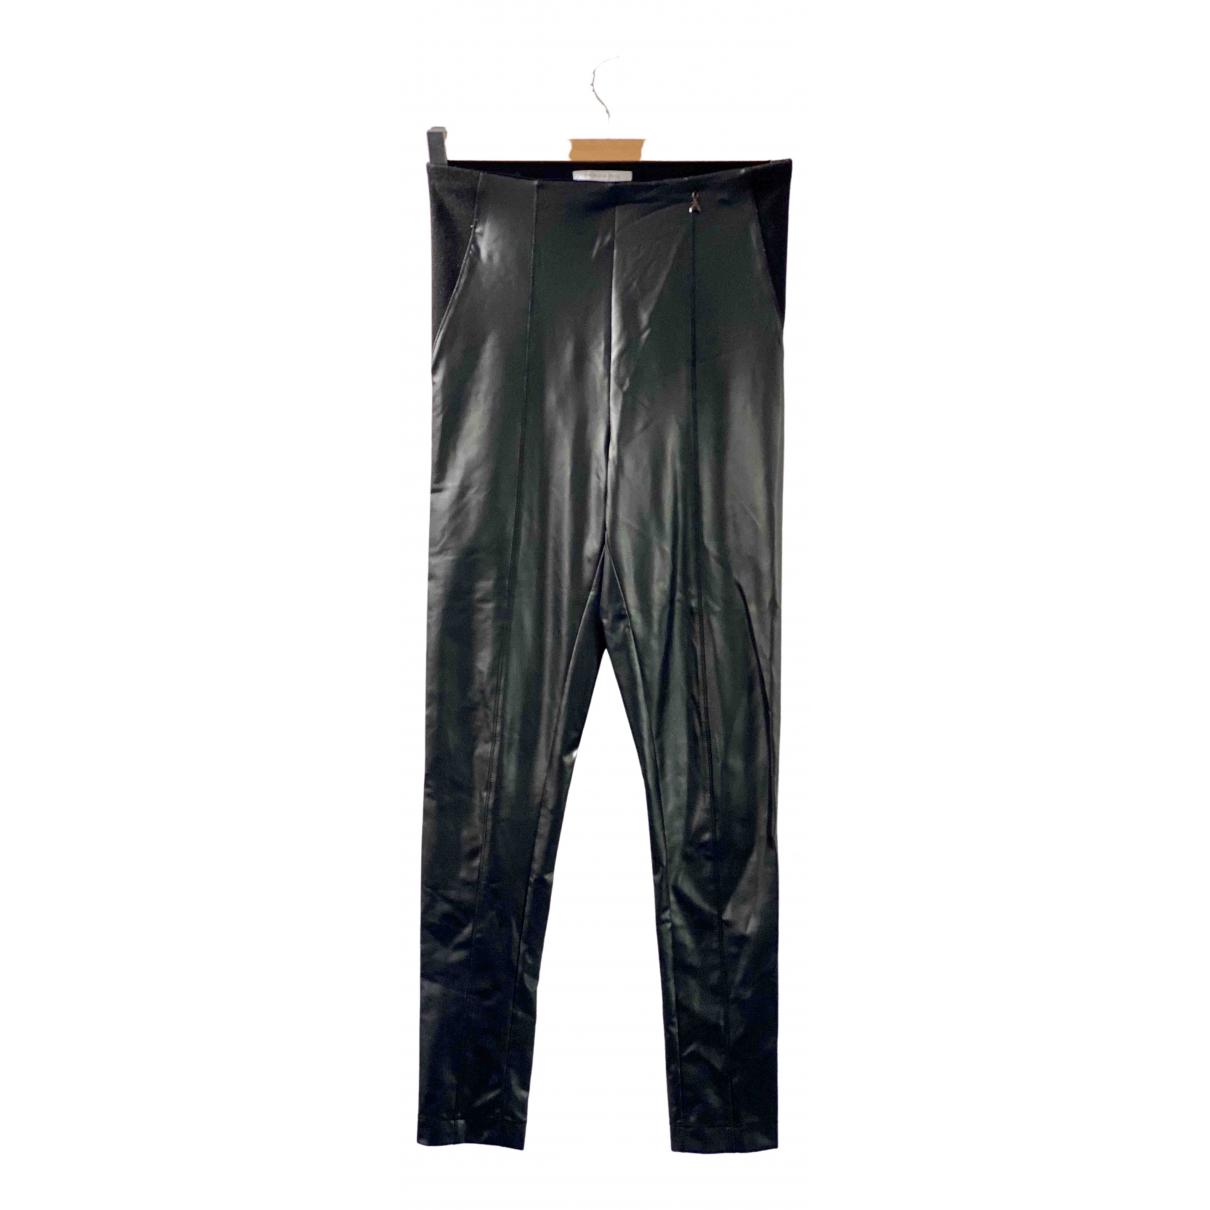 Patrizia Pepe \N Black Trousers for Women 0 0-5